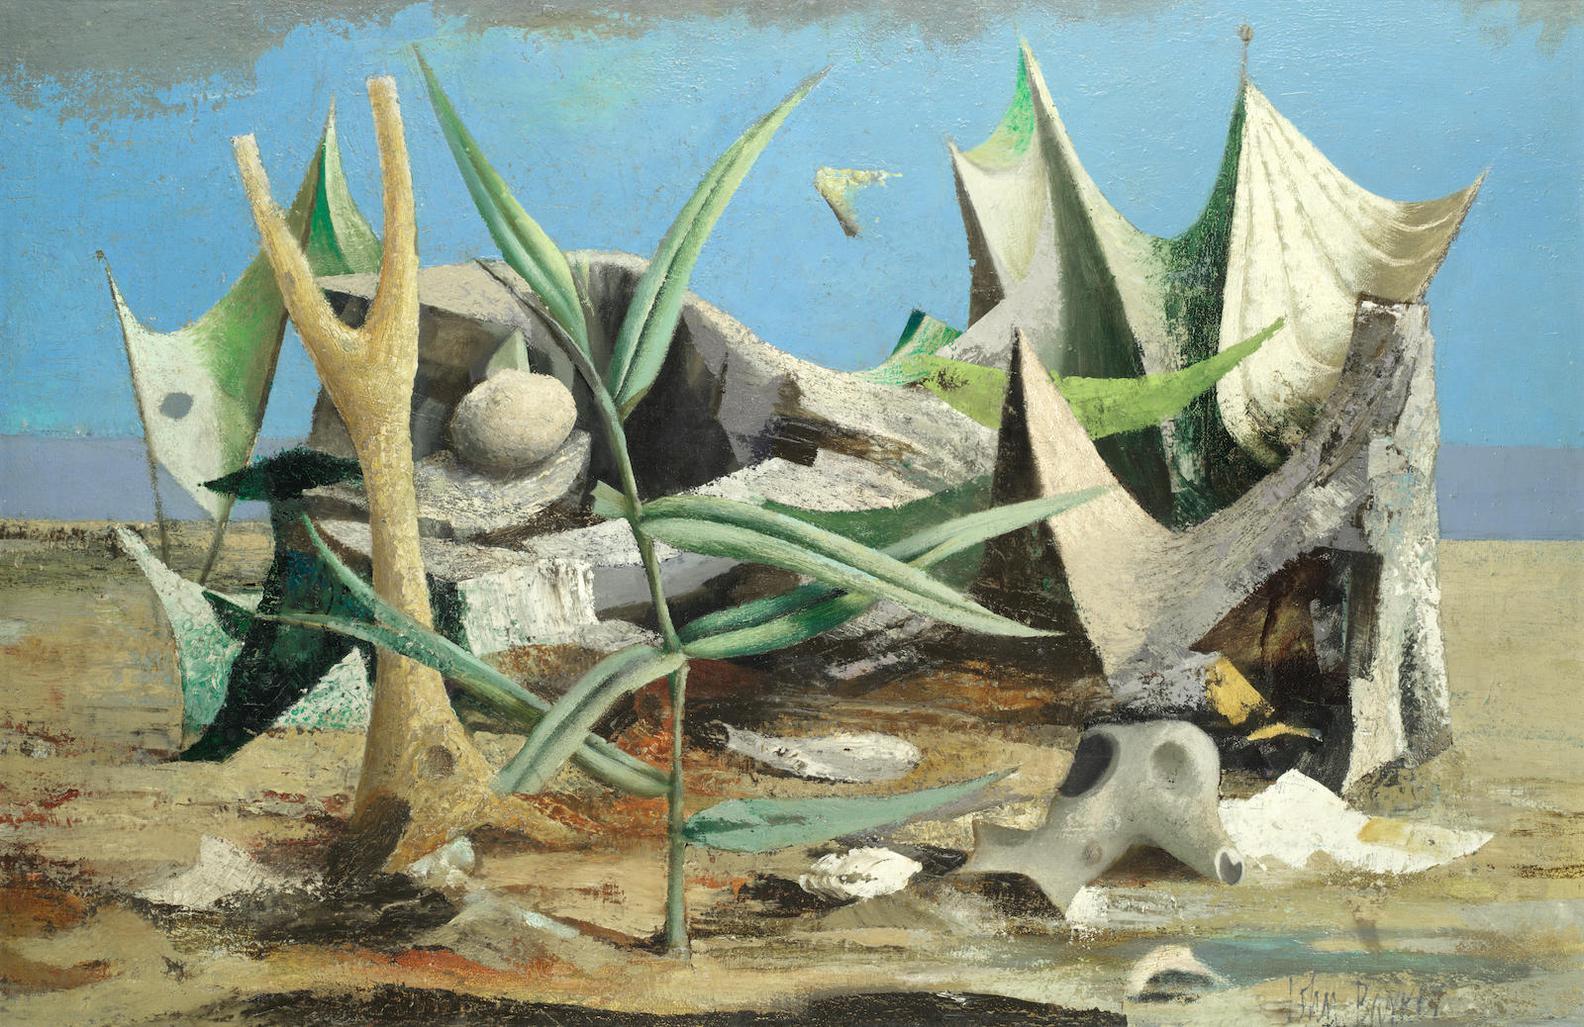 John Rowland Barker - Surrealist Composition In A Landscape-